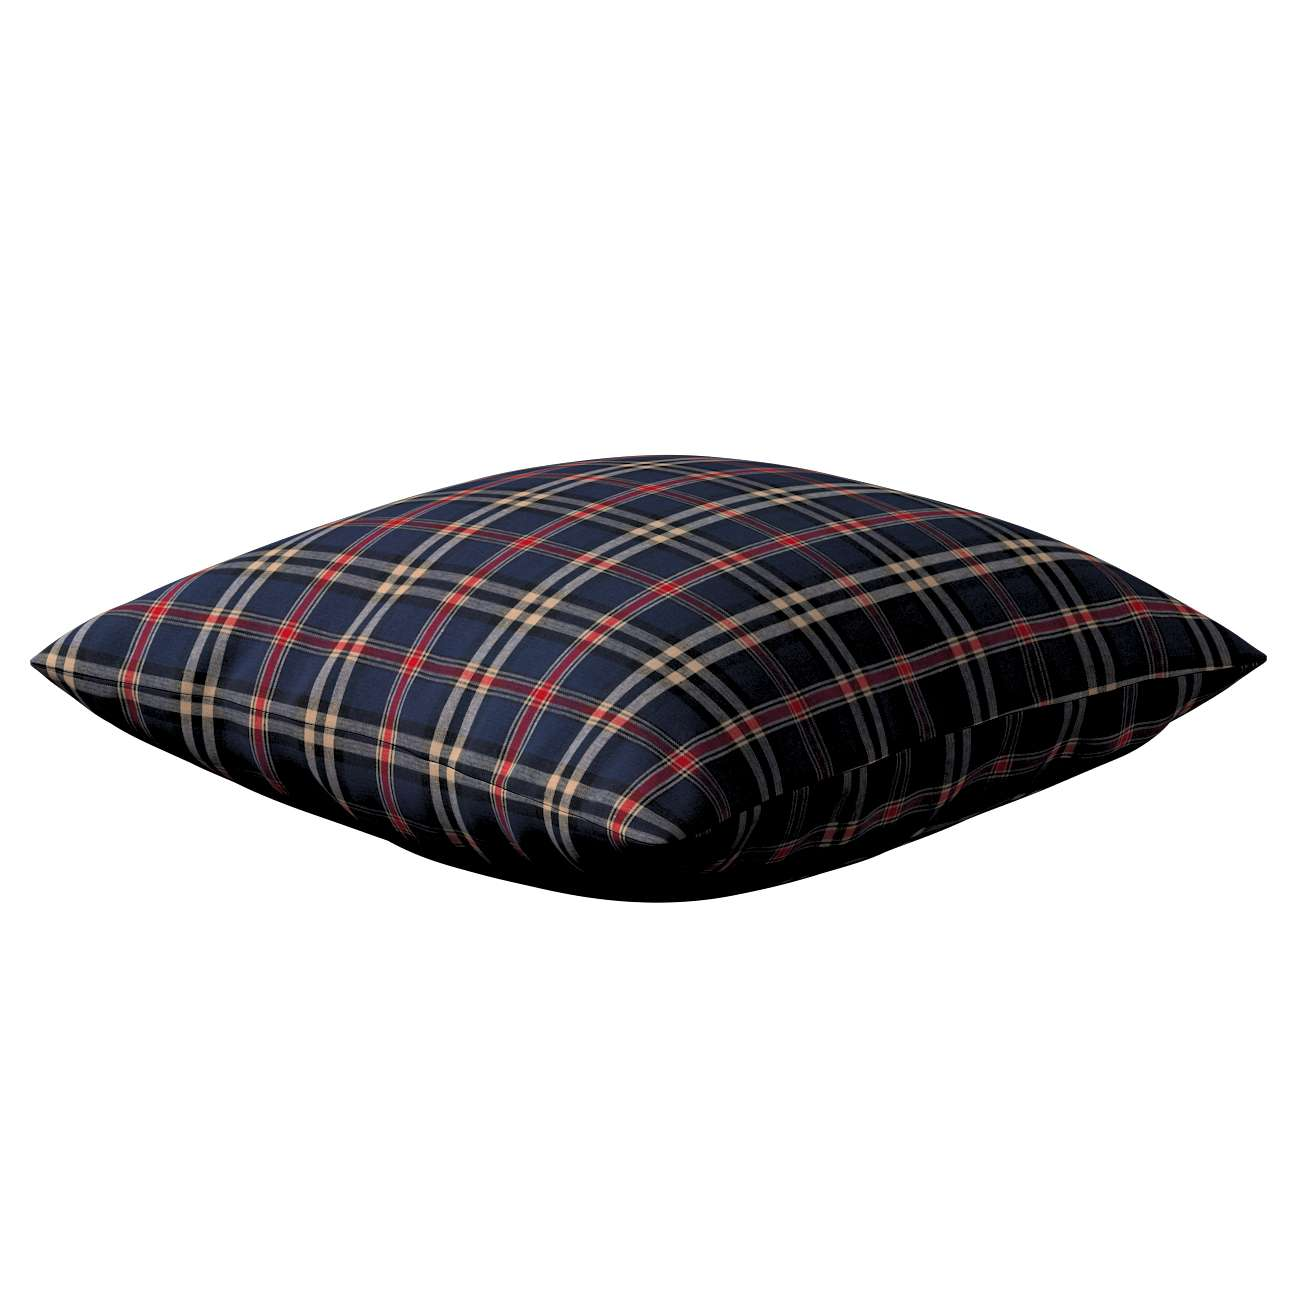 Poszewka Kinga na poduszkę w kolekcji Bristol, tkanina: 142-68